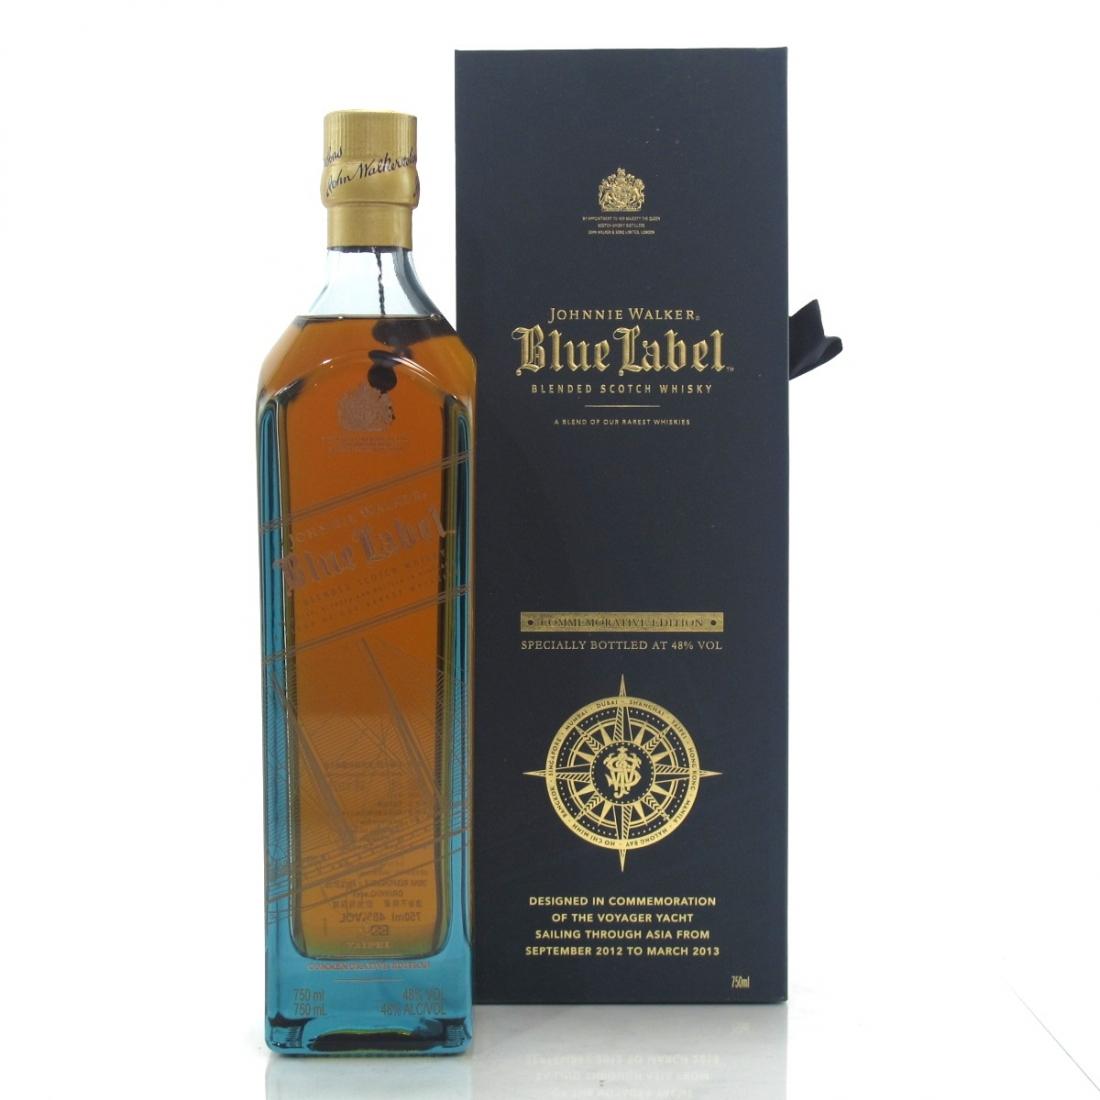 Johnnie Walker Blue Label Voyager Commemoration 48% / Taipei Exclusive